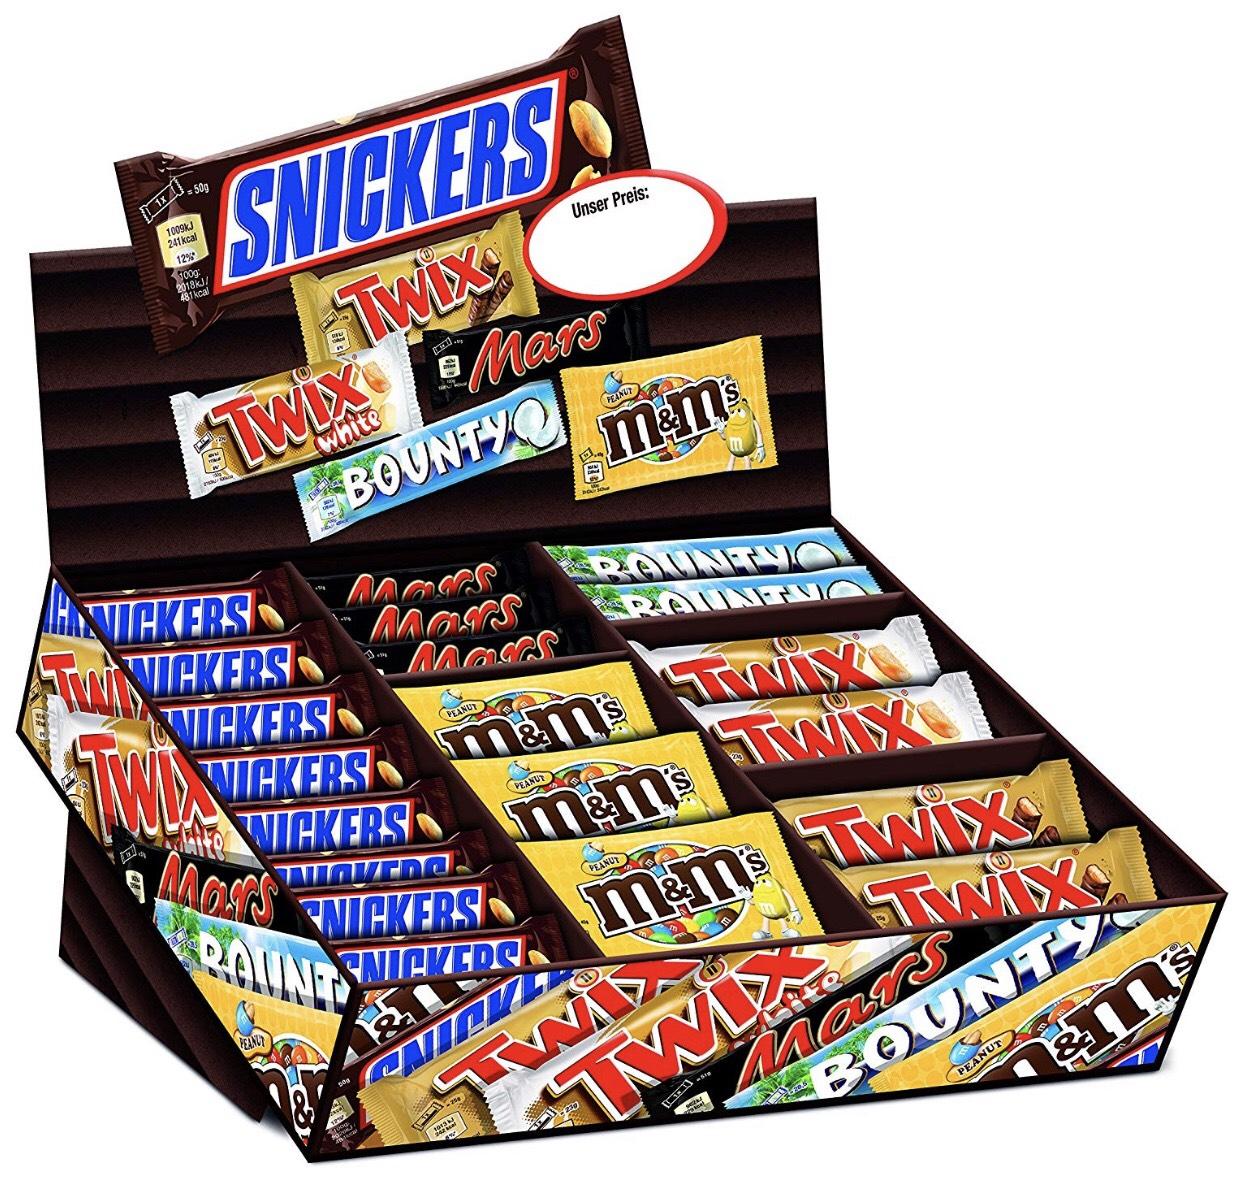 Mars Topsellerbox 72 Riegel (1x 3,6kg) für 26,24€ [Amazon] Snickers, Twix, M&Ms, Twix White